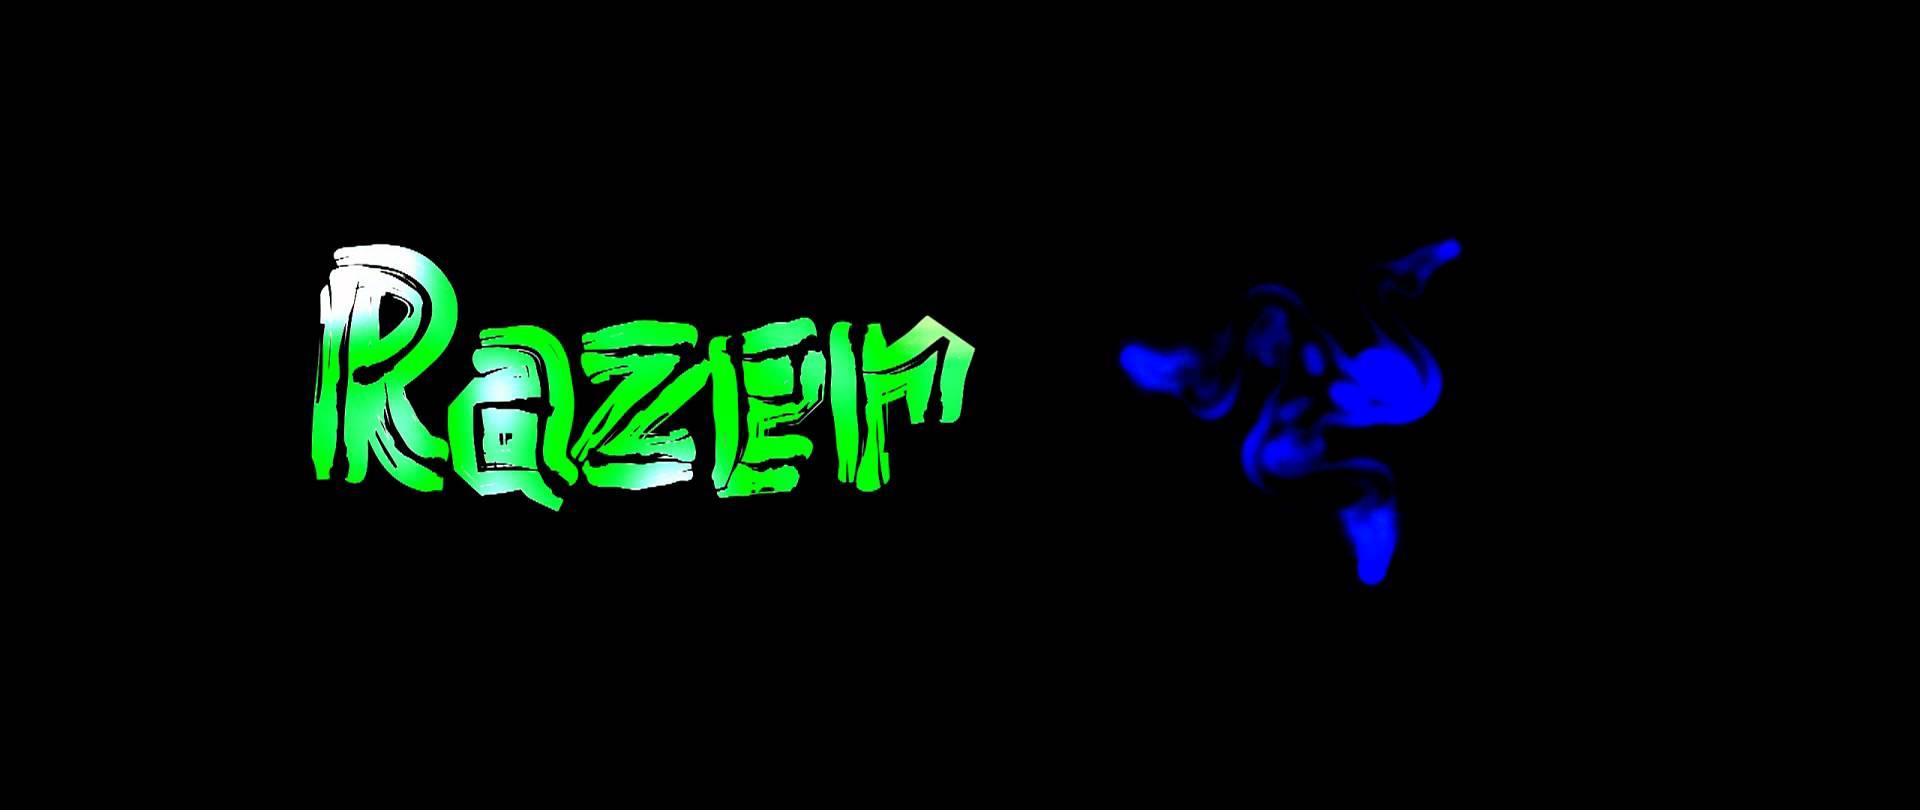 Free Download Razer Logo Animated Wallpaper 1080pmp4